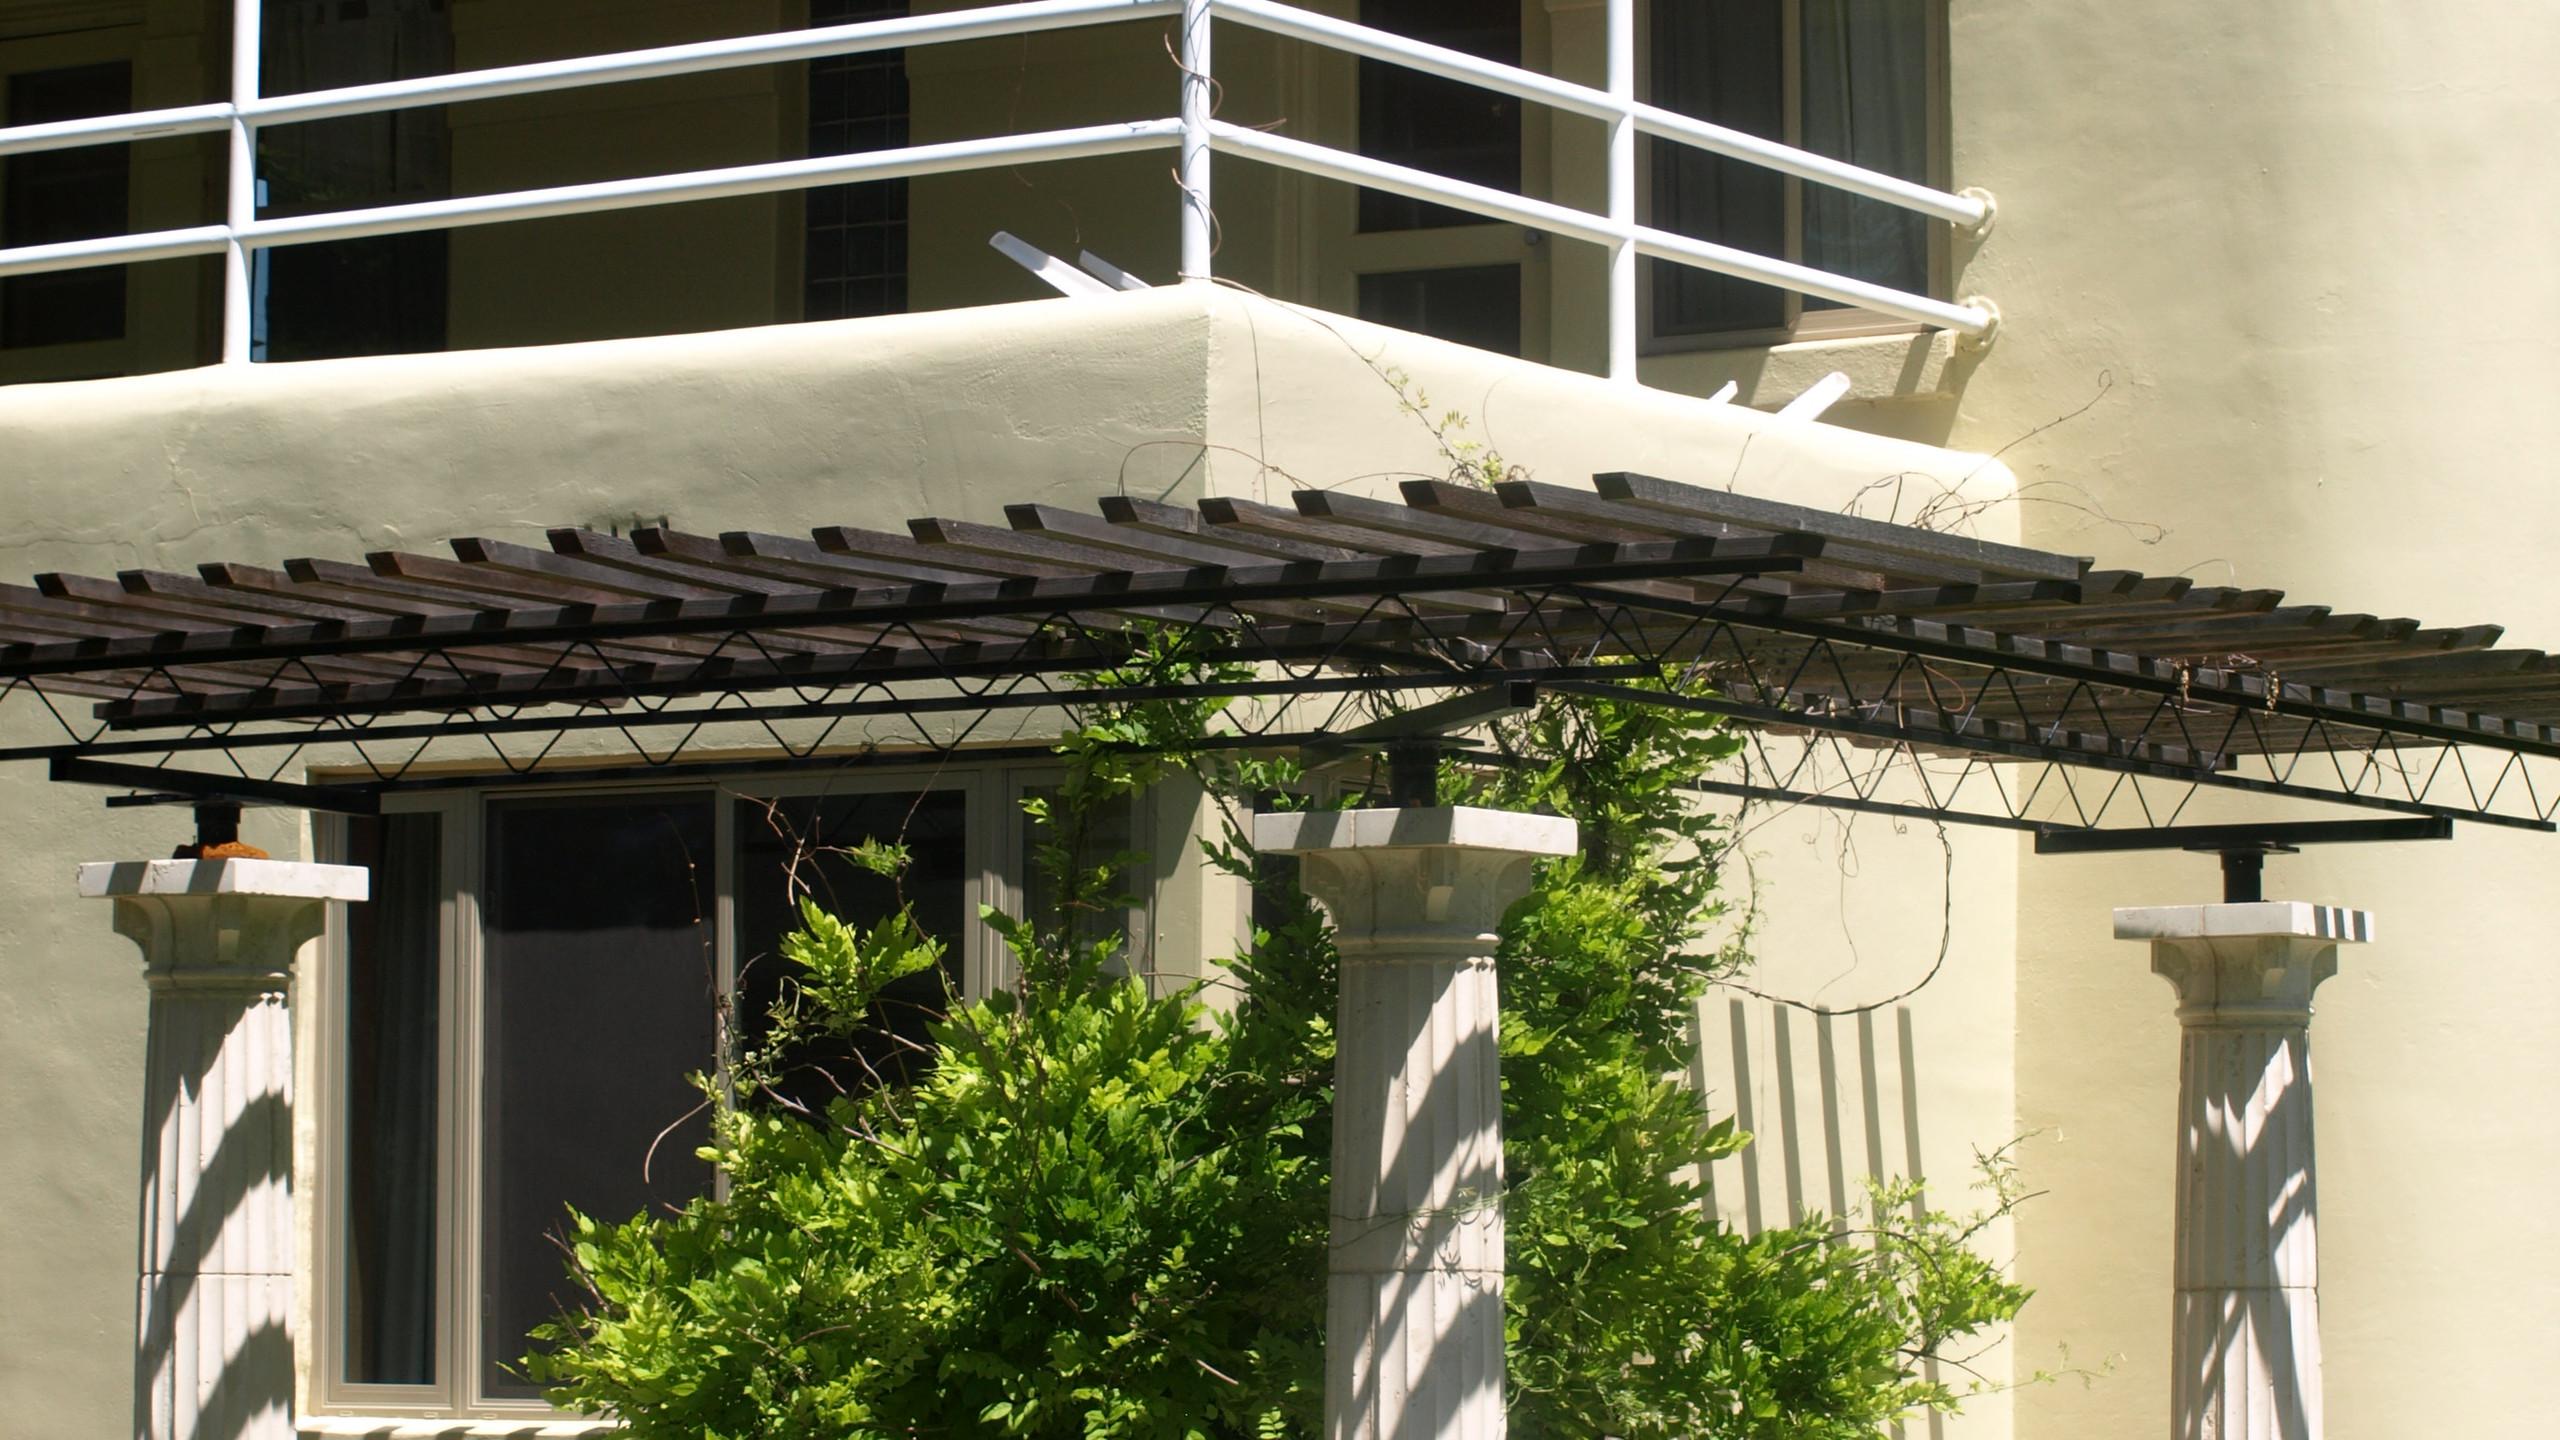 Art Deco Pergola with 3 columns